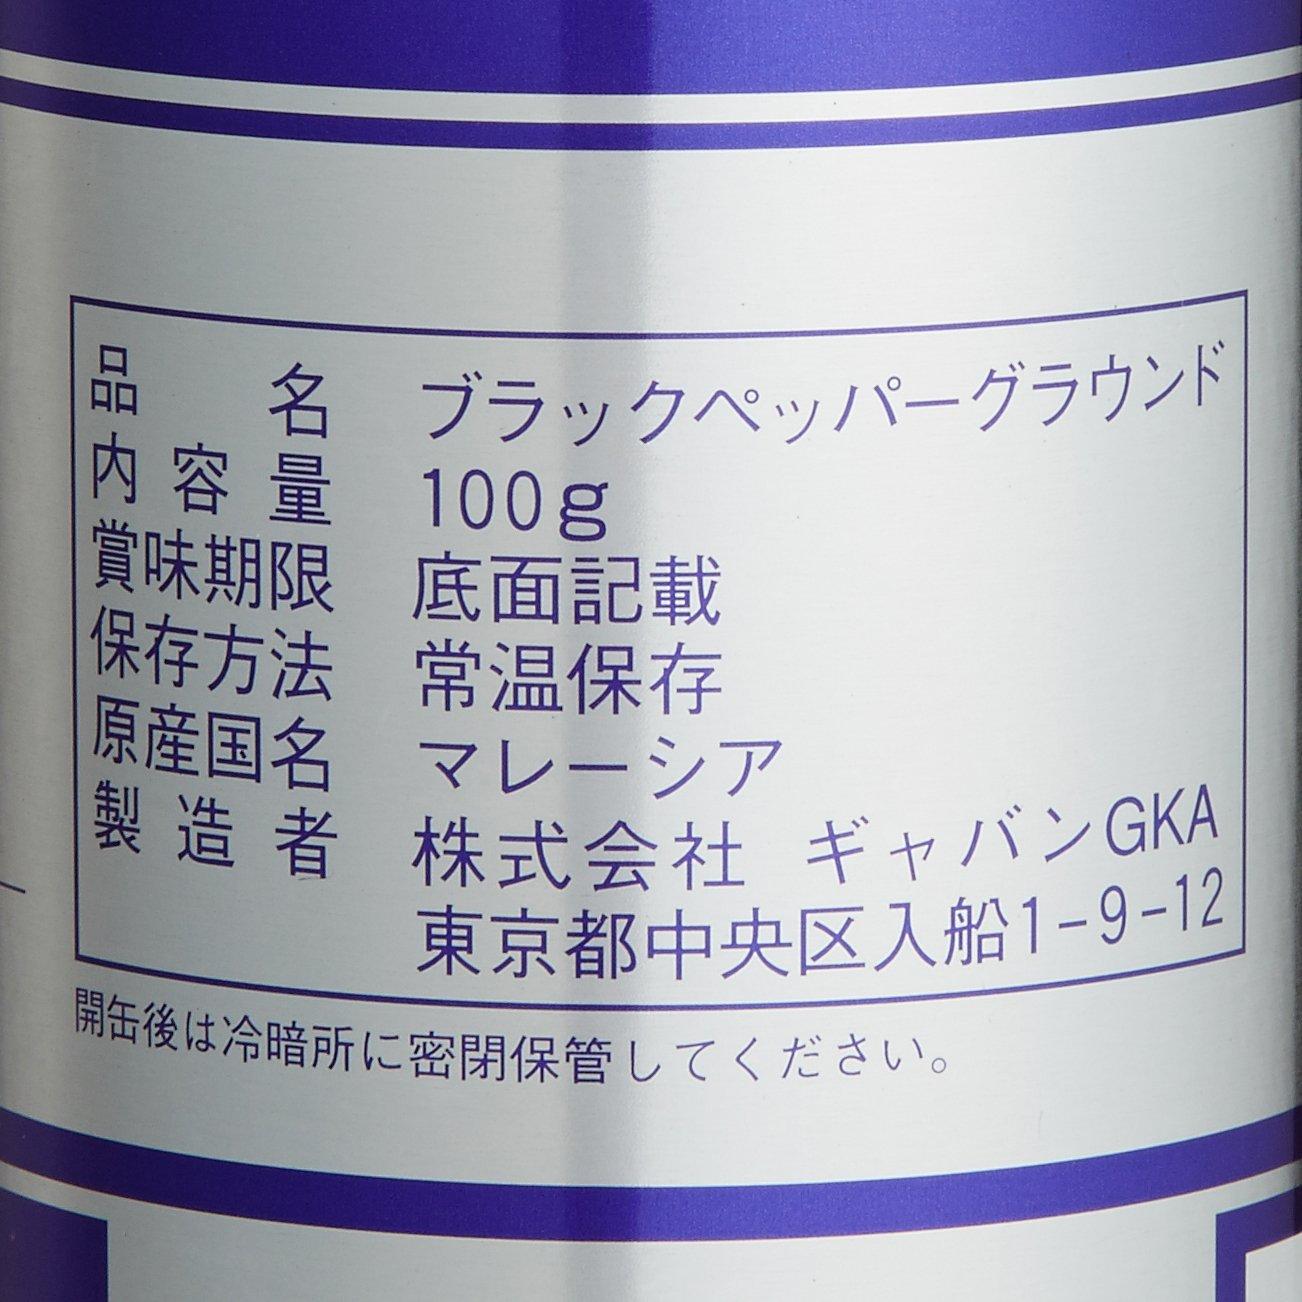 Black Pepper Ground 100gX2 this